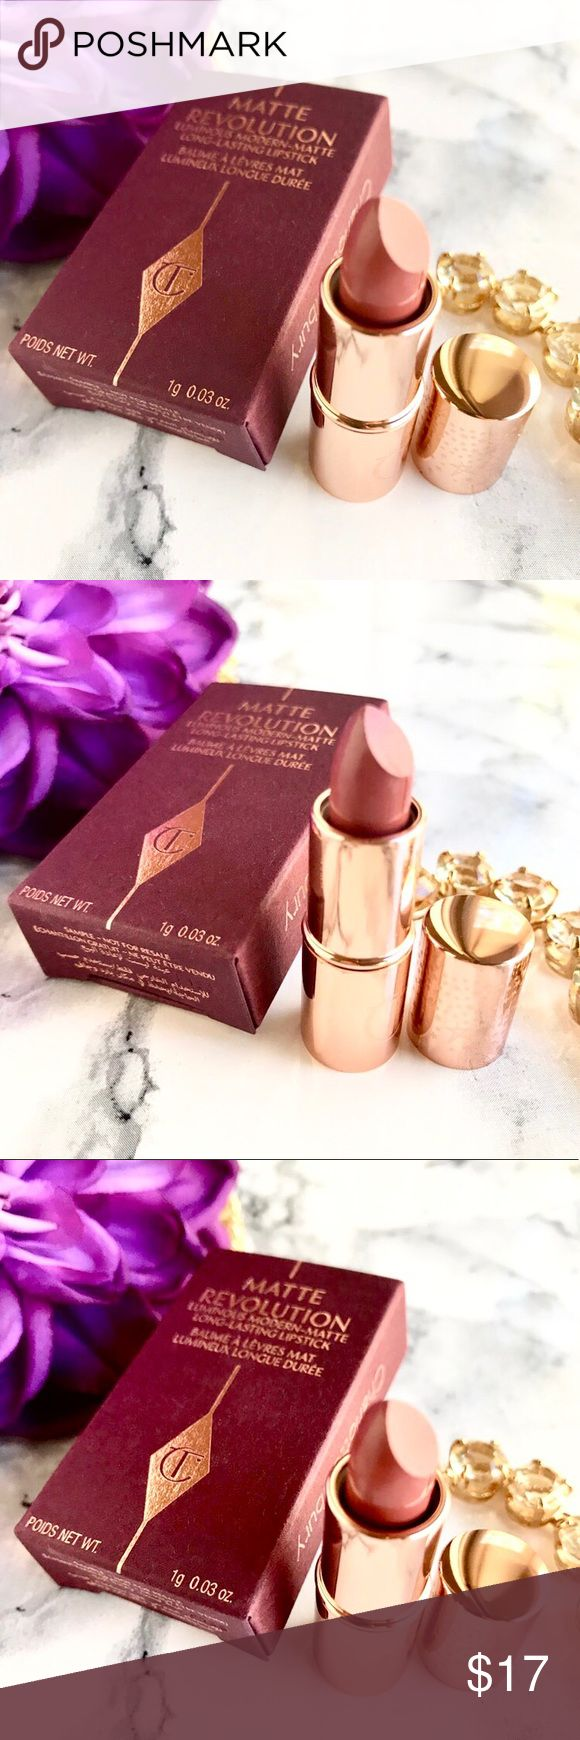 NIB CT Matte Revolution Lipstick PILLOW TALK Boutique